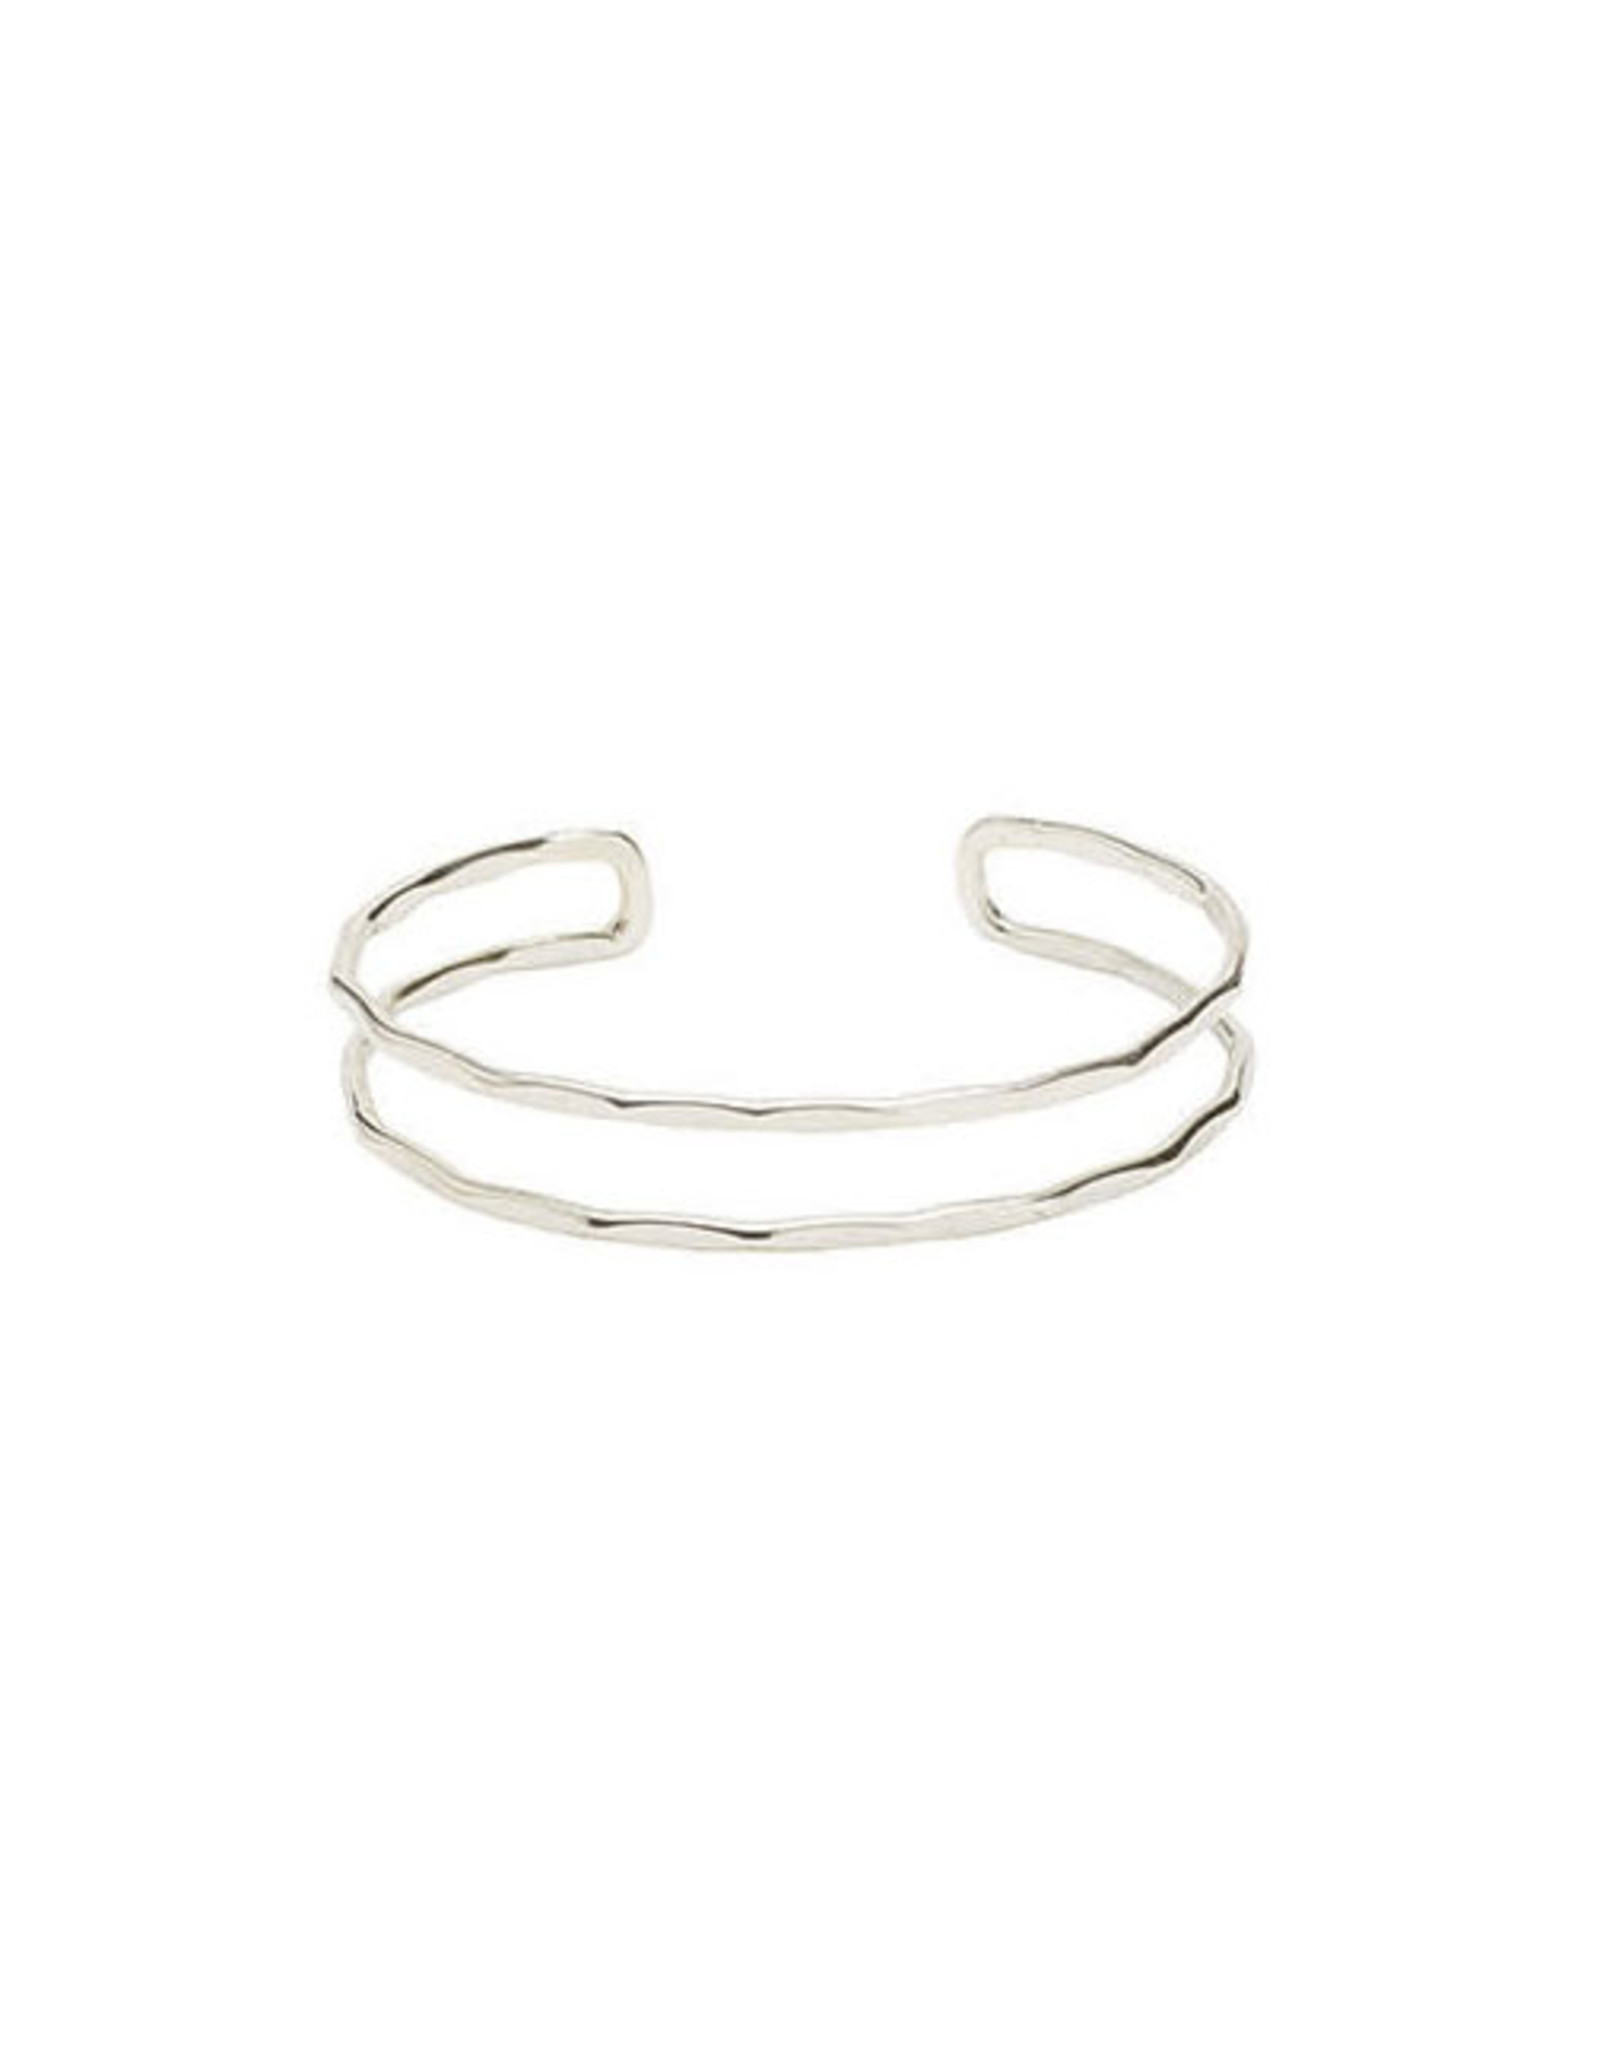 Parallel Cuff - Silver